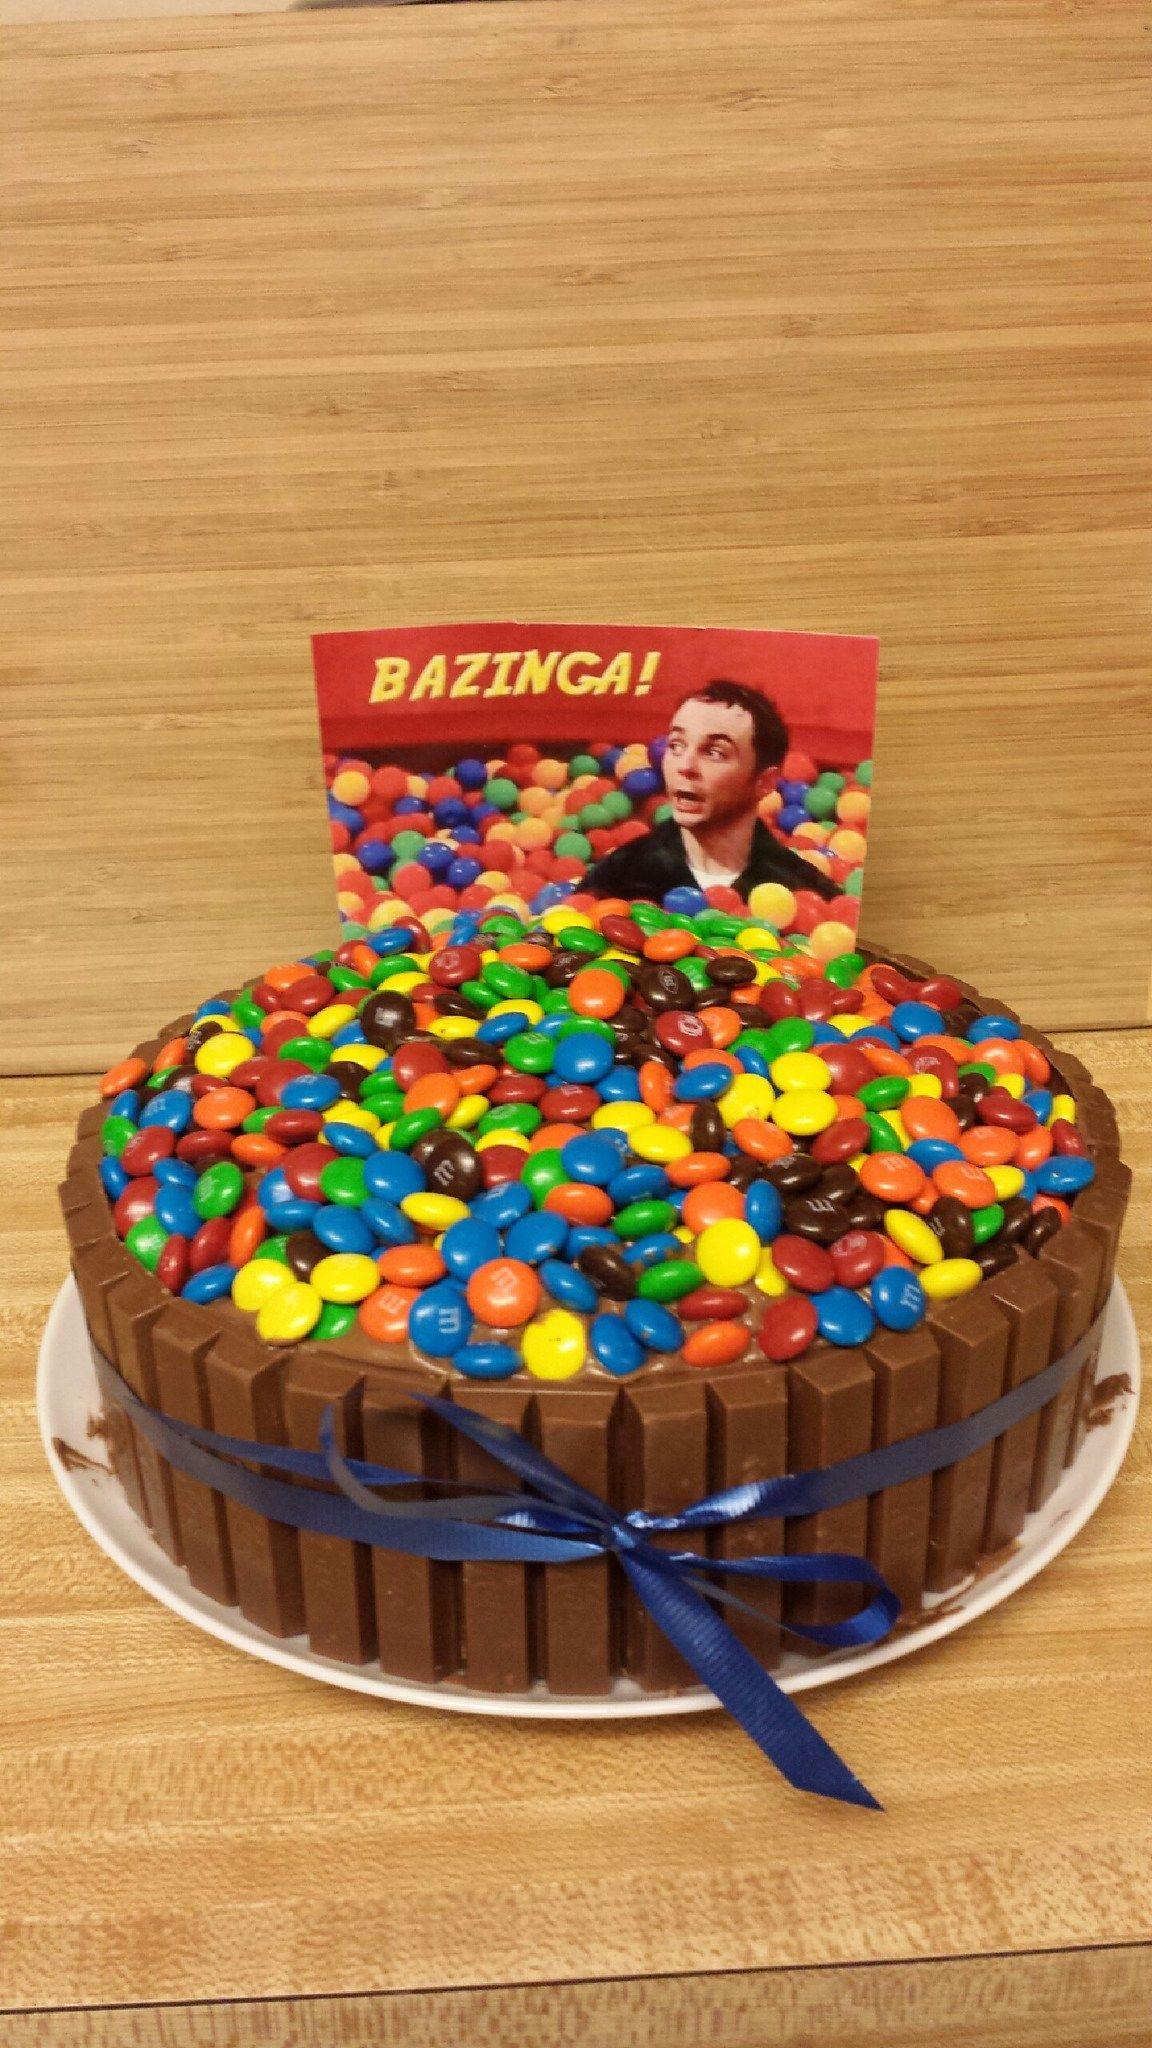 Bazinga cake for my husband's birthday Food Pinterest